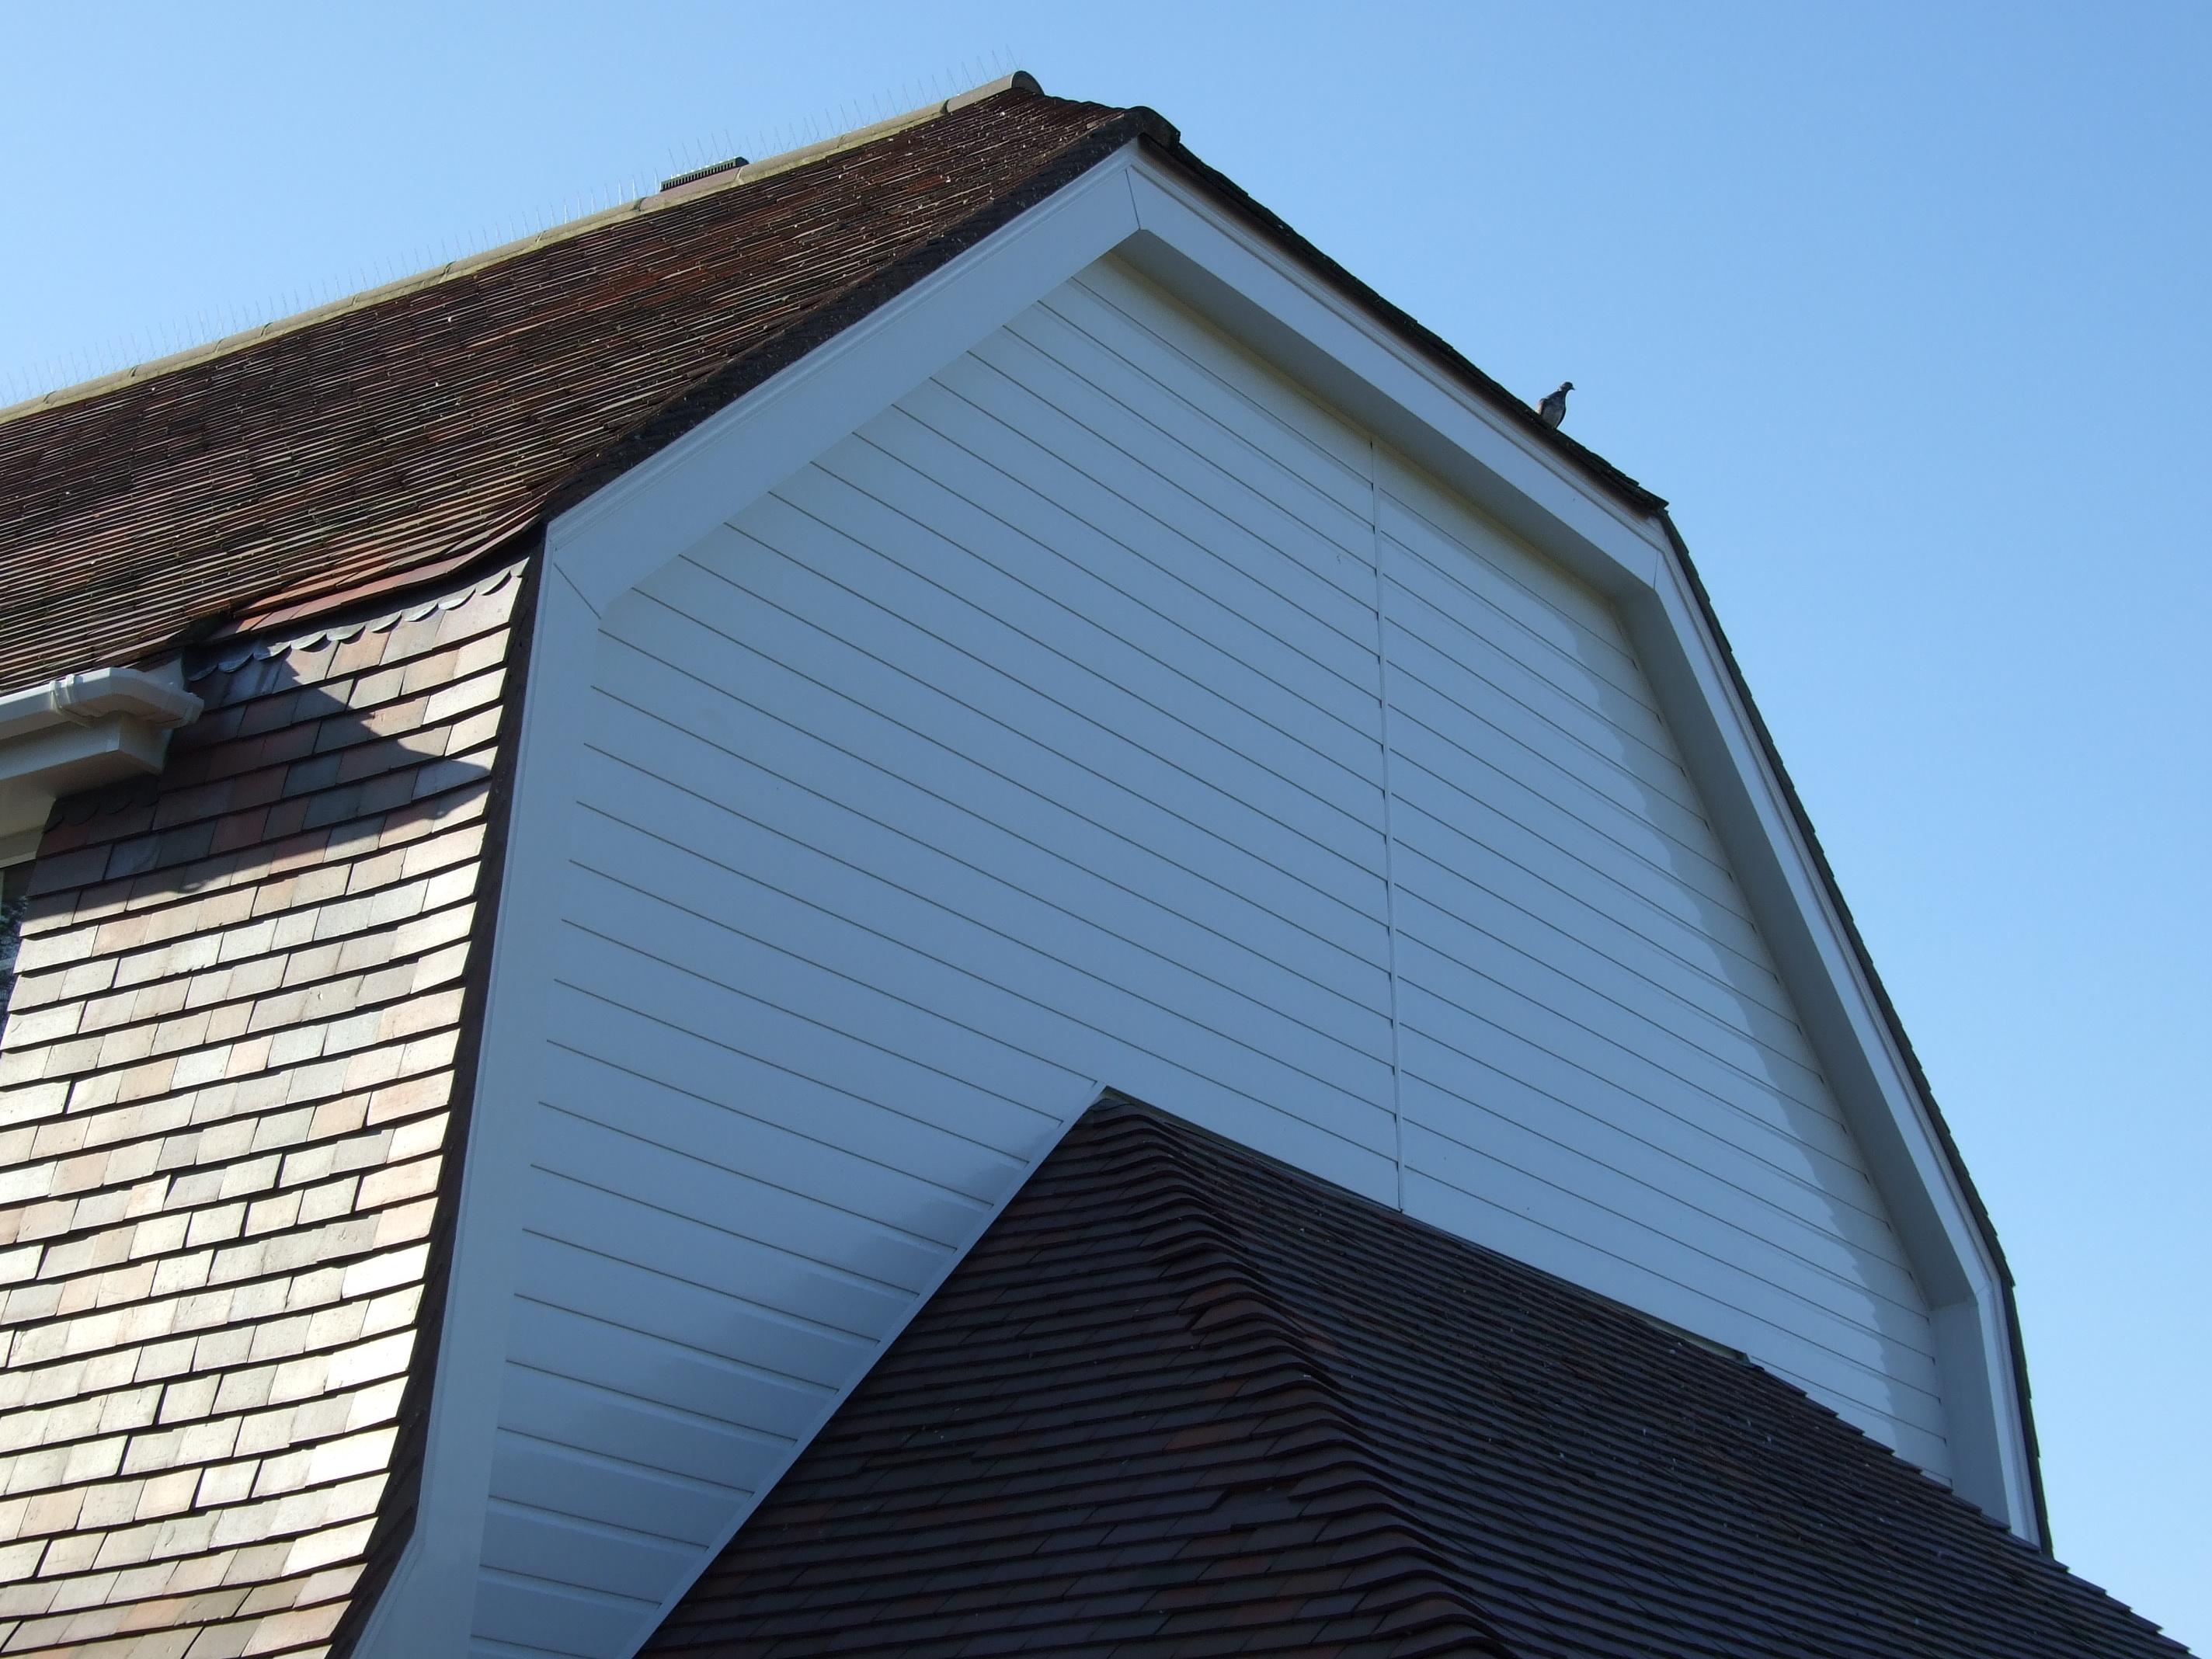 Cladding Homefront Roofline Ltd Of Surrey